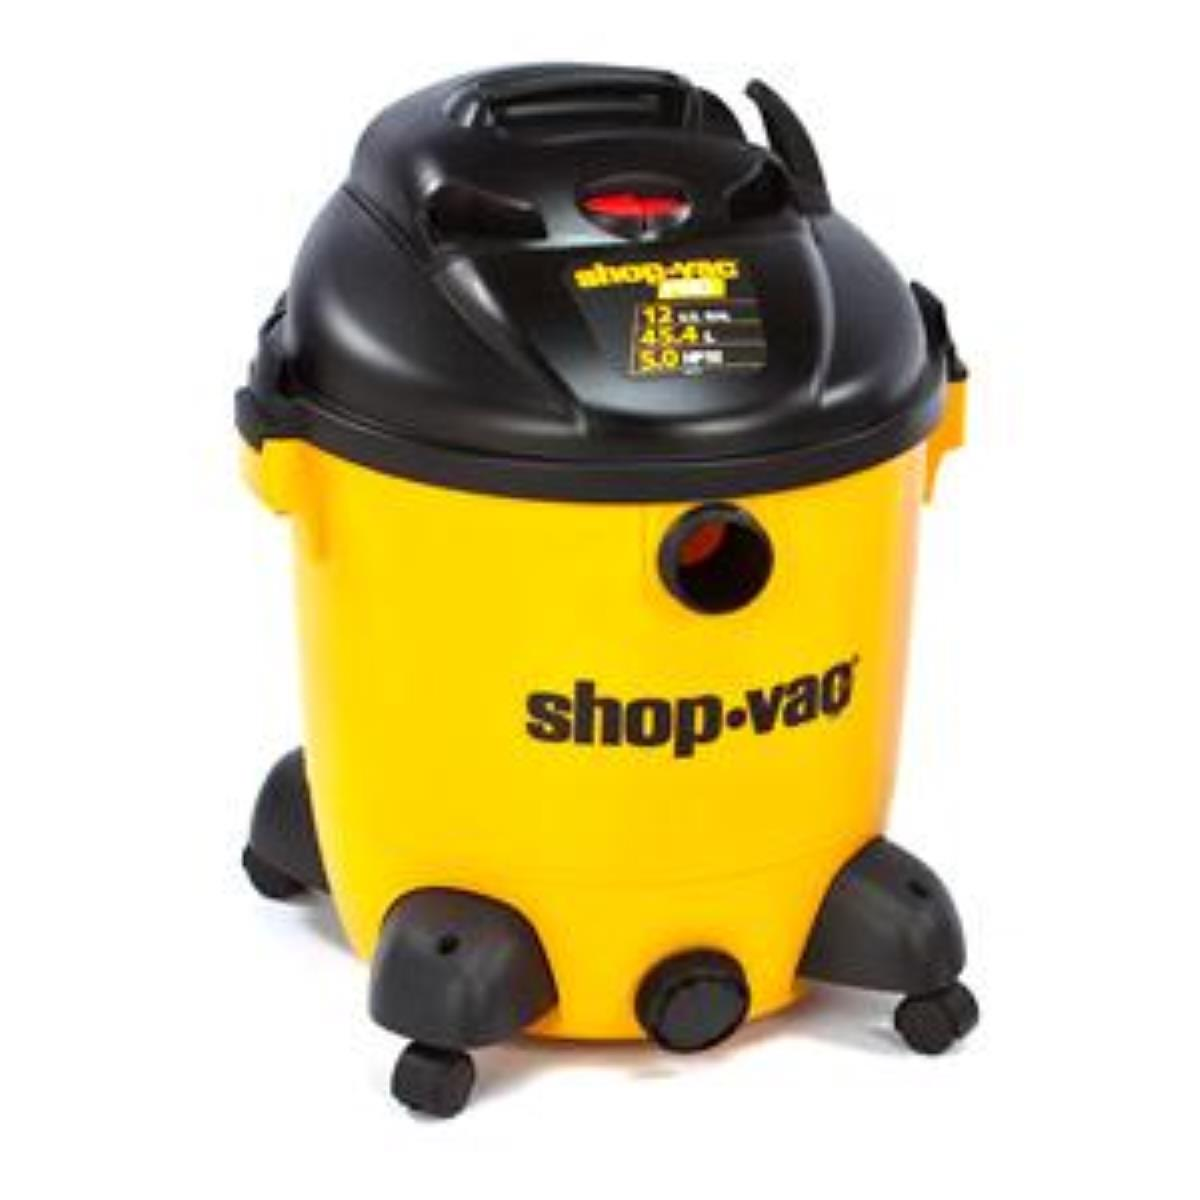 Shop-Vac 9651200 Pro Series Wet/Dry Vacuum, 12 Gallon